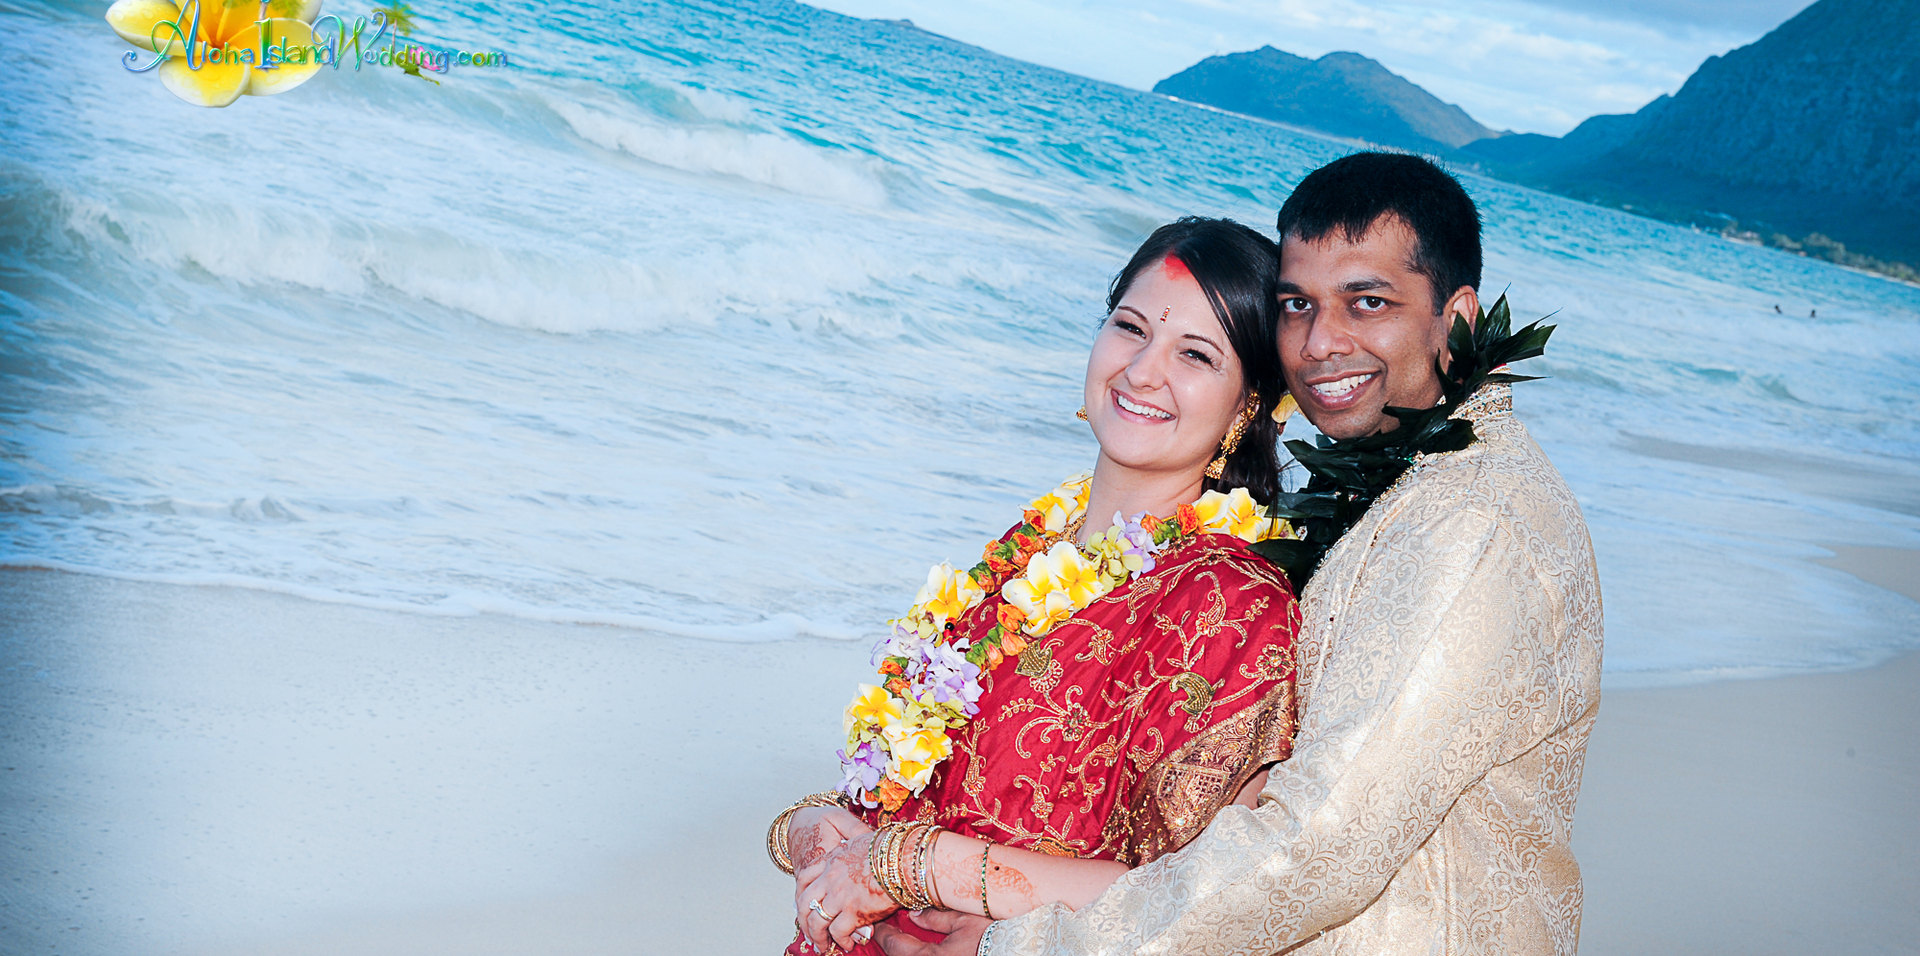 Indian wedding ceremony in hawaii-277.jp